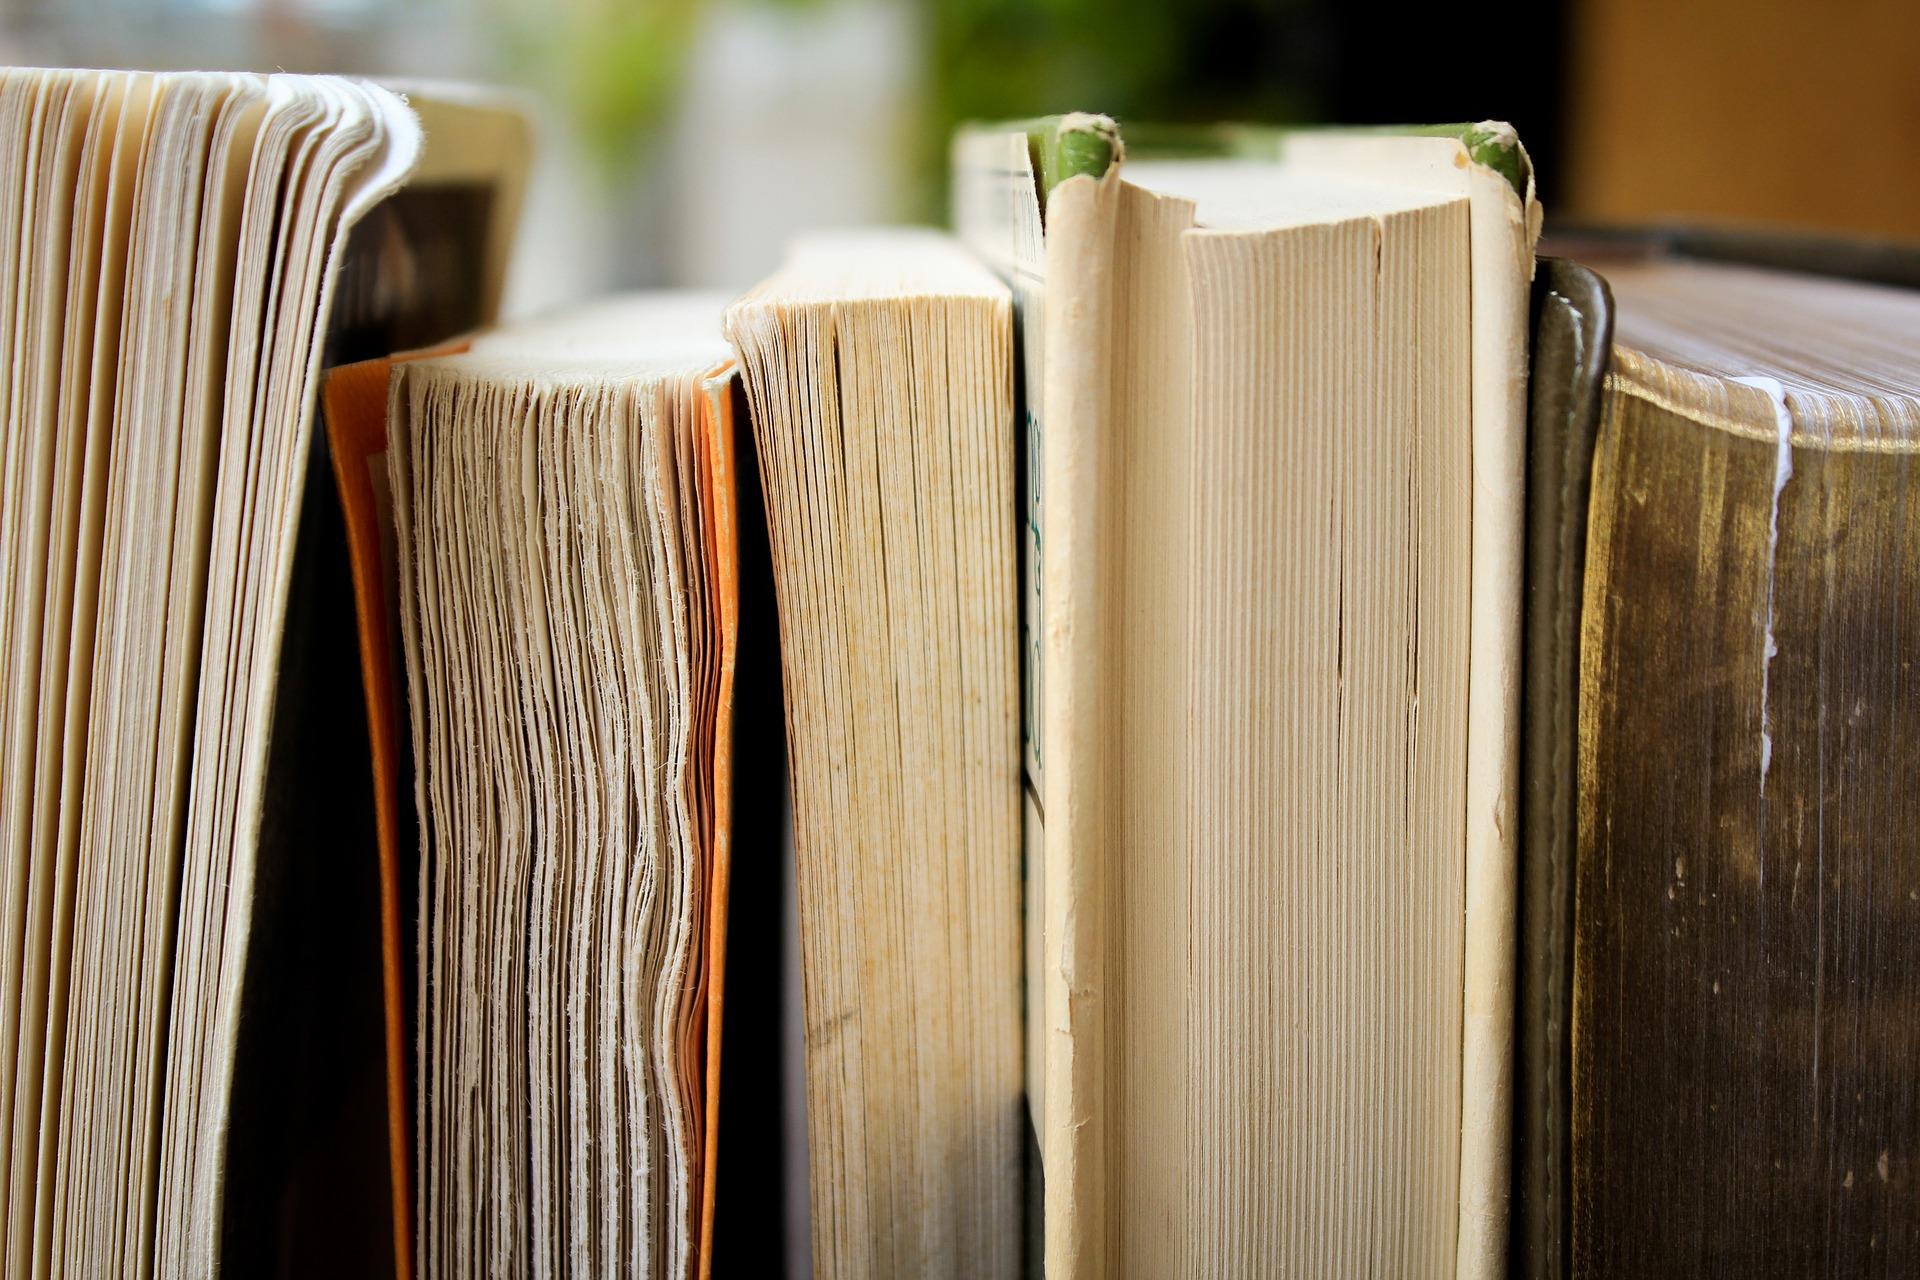 Book reviews by Dawn McGuigan